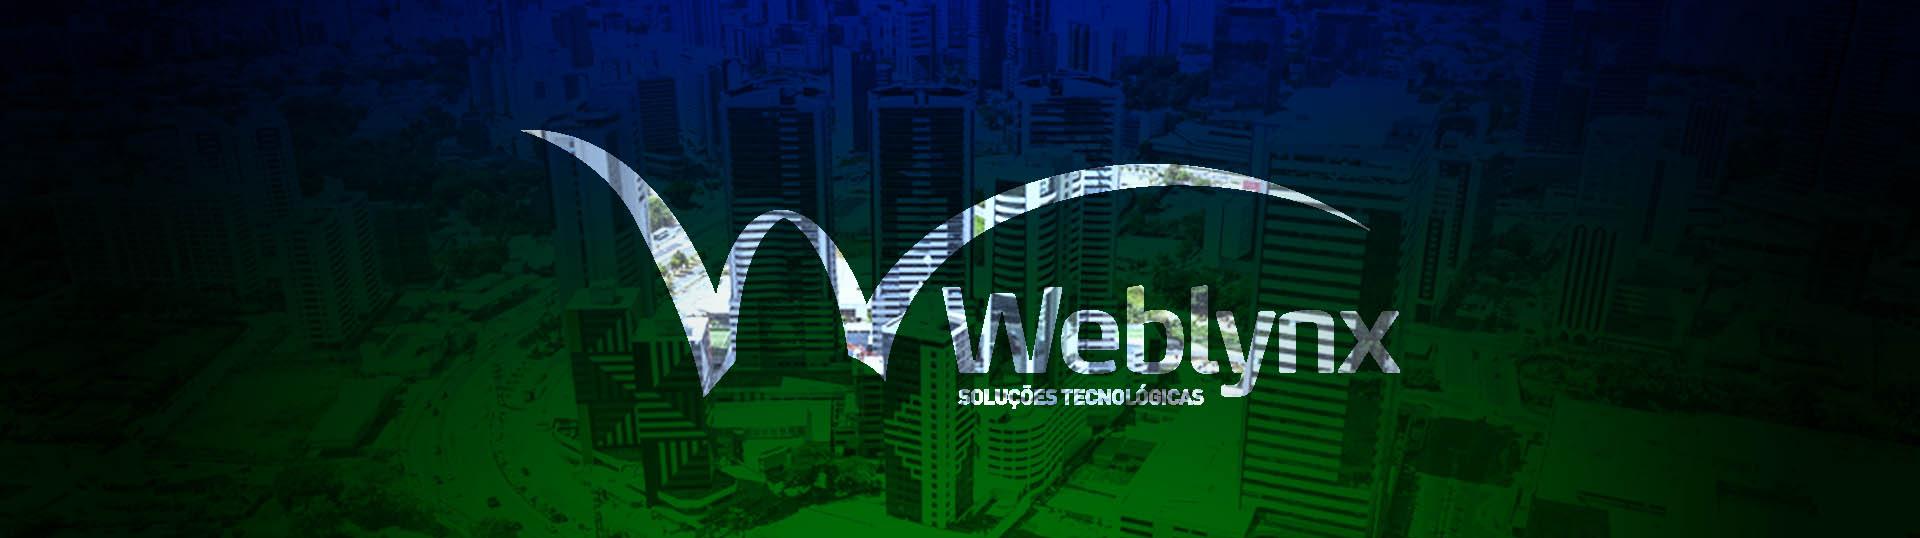 banner-blog-weblynx